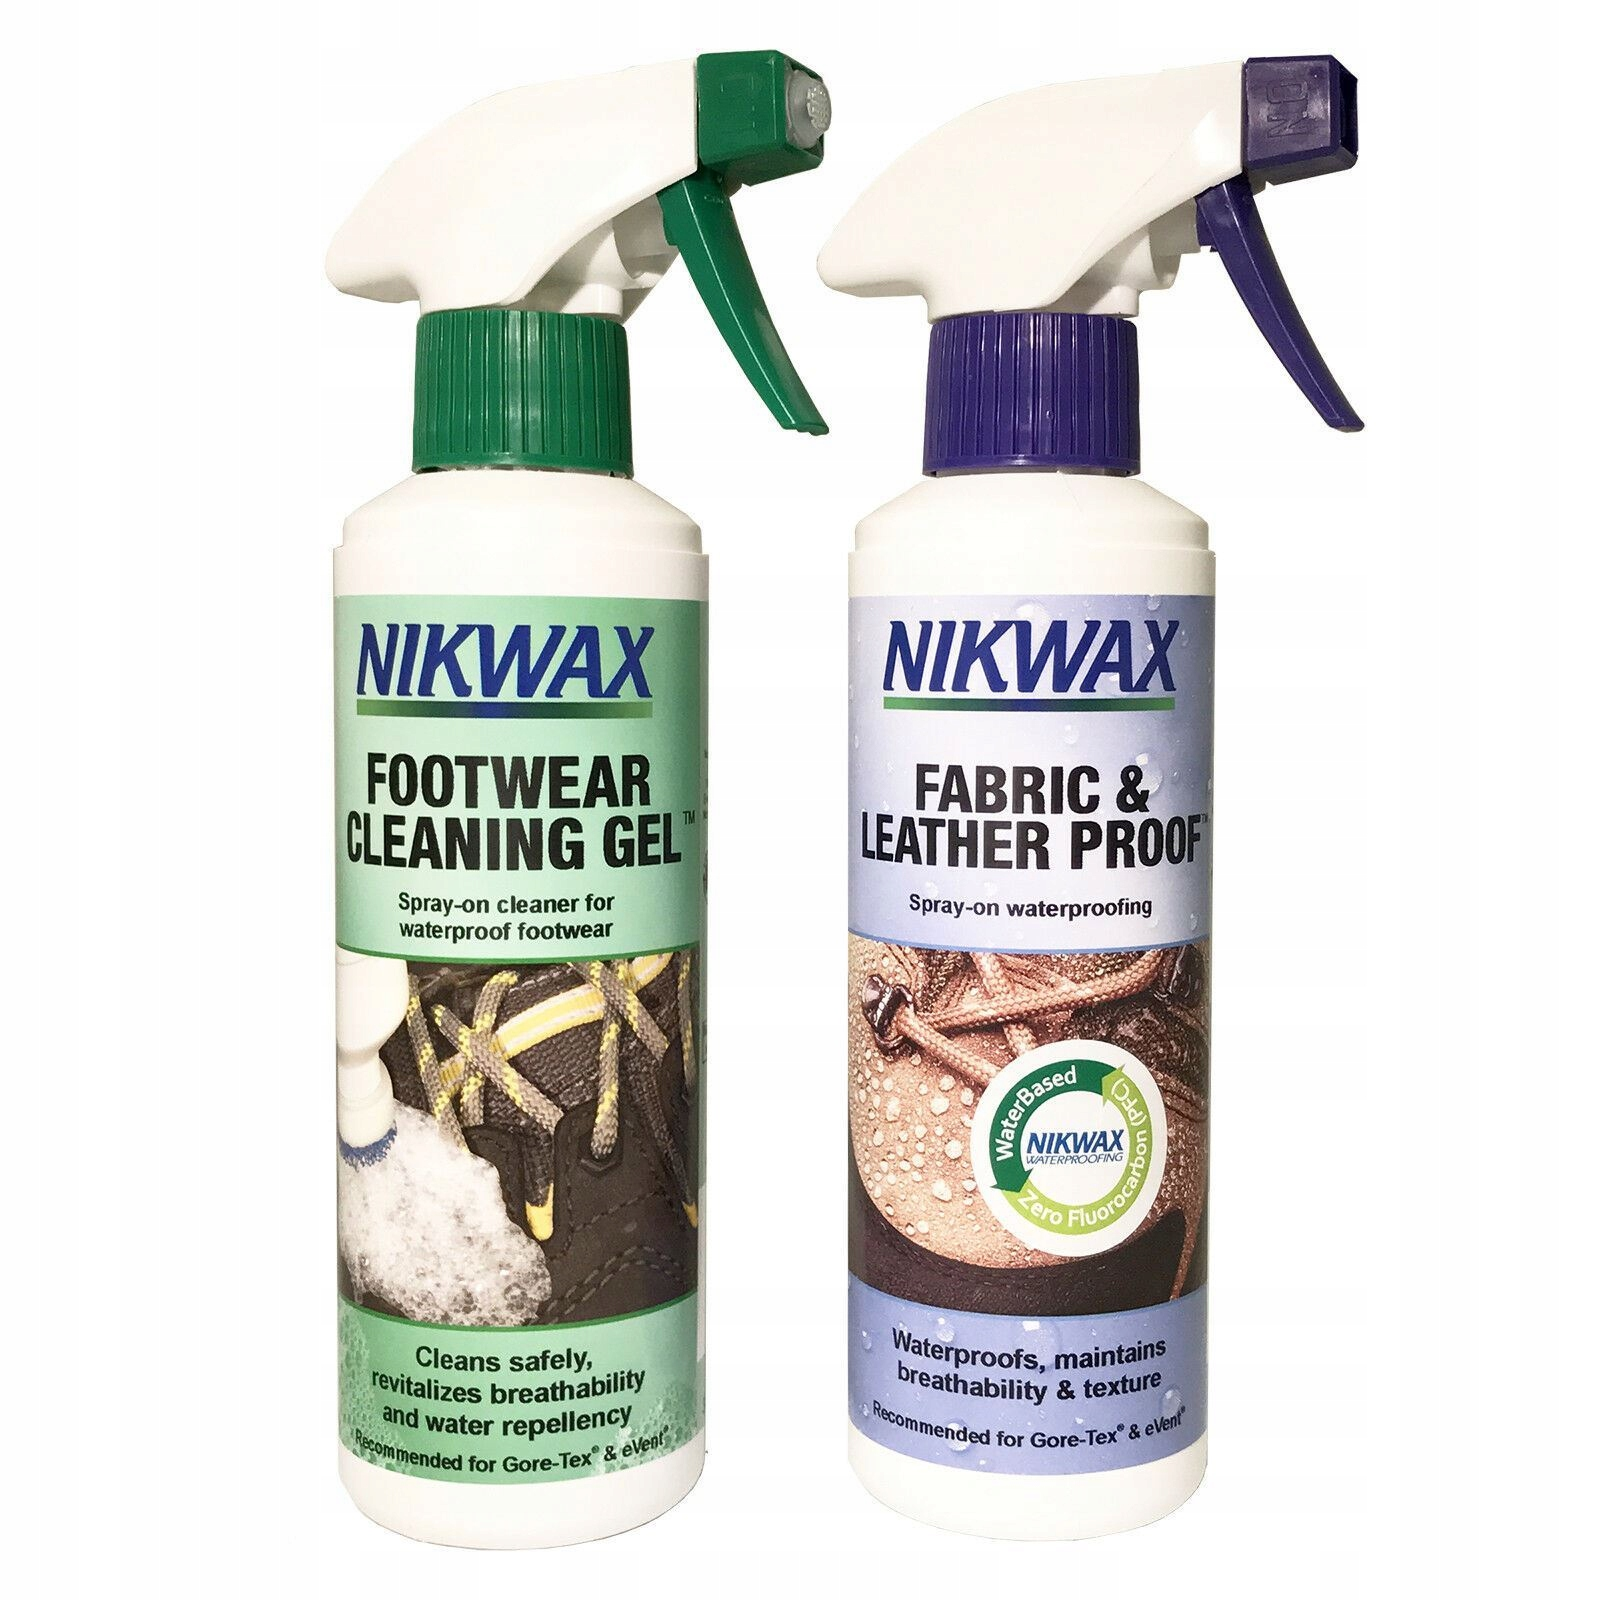 Nikwax Набор Ткань Кожа и Гель для обуви, 300 мл